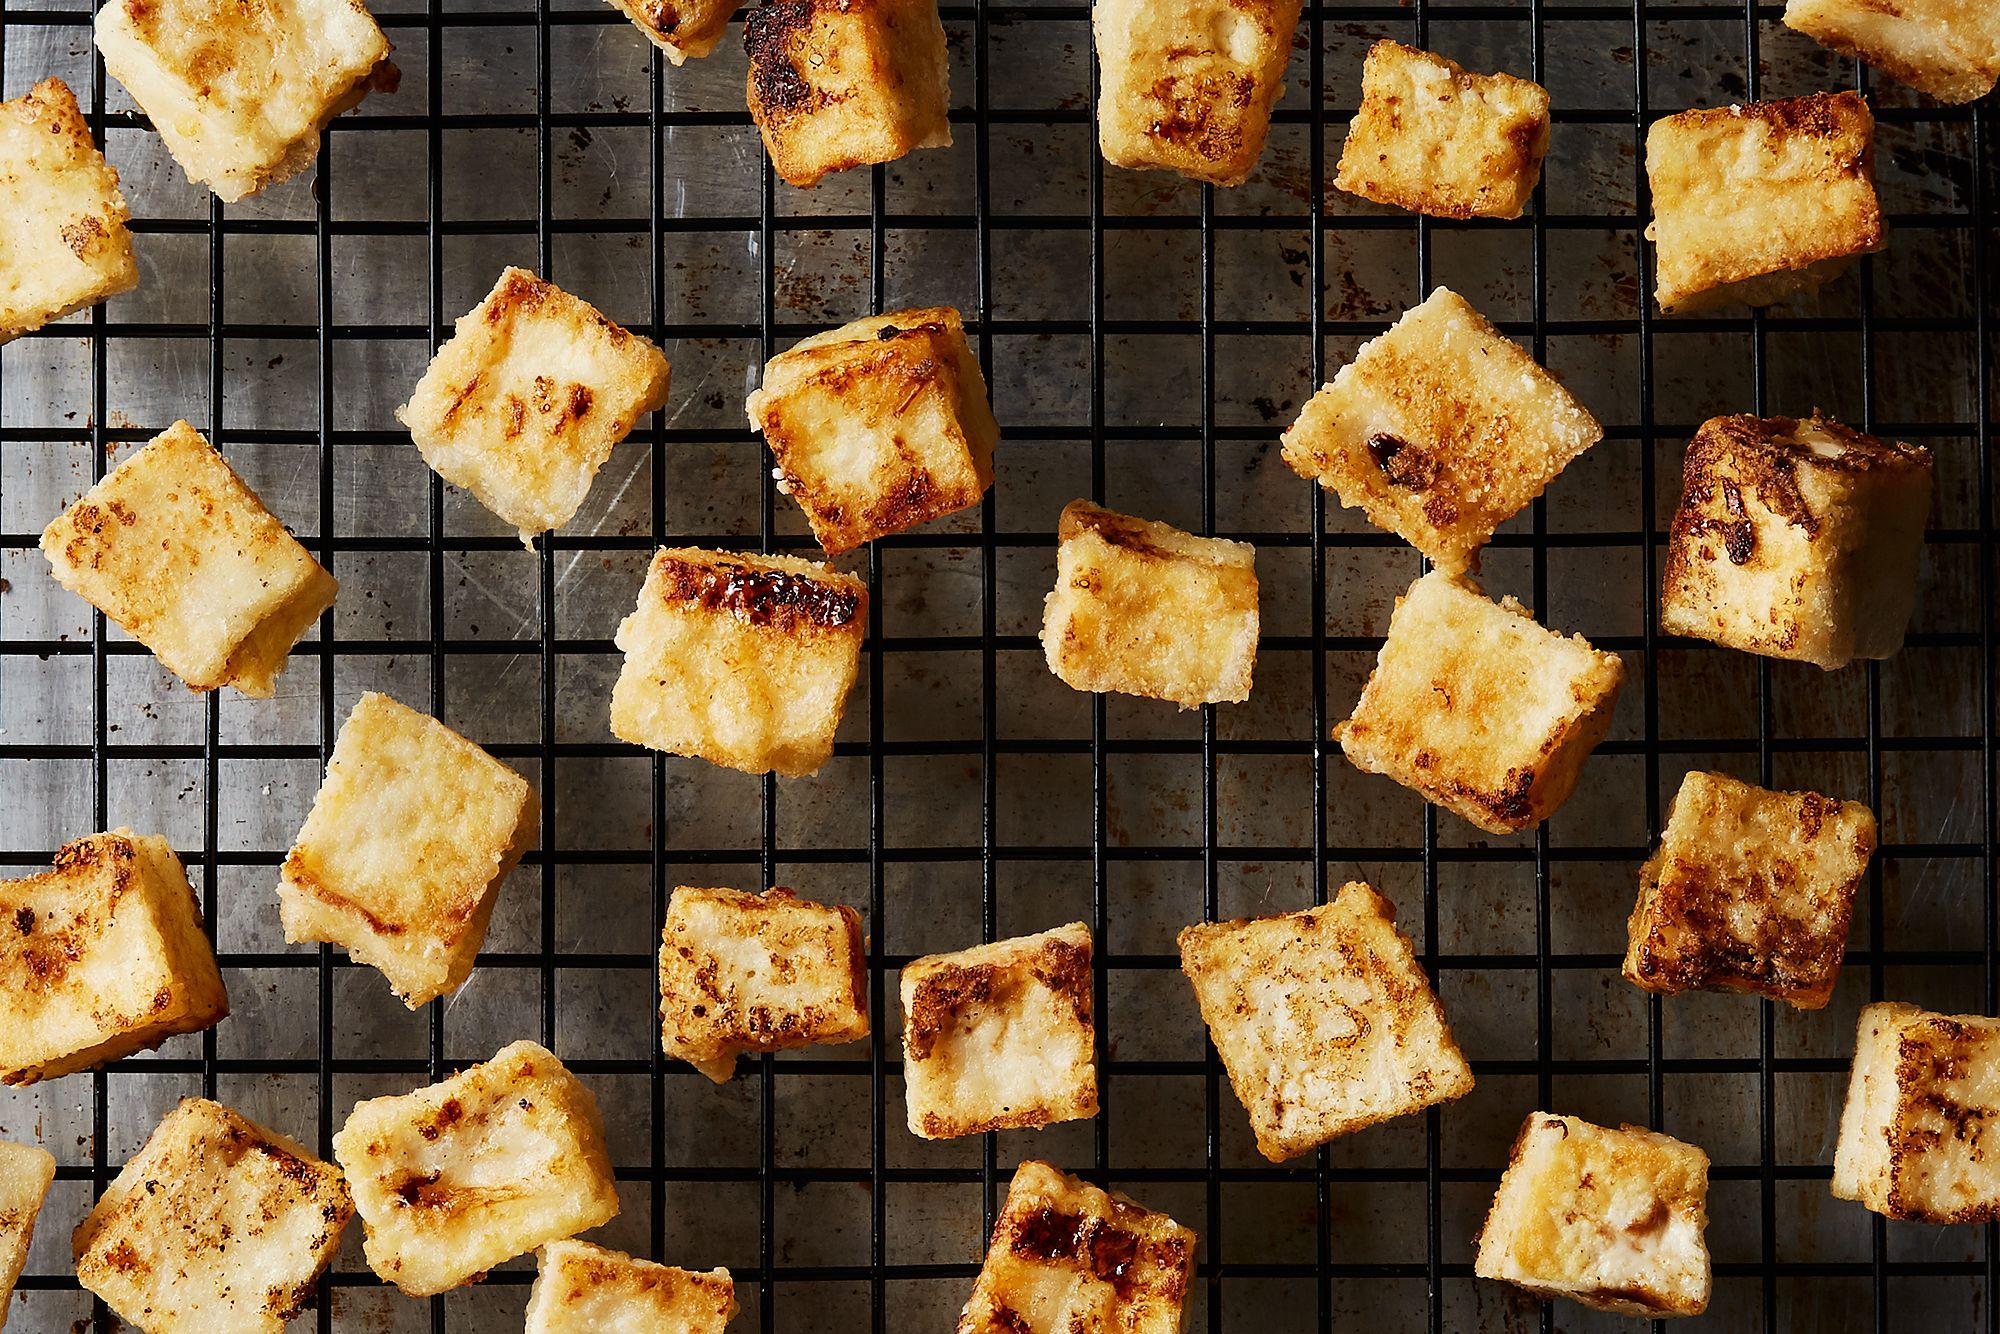 Salz-und-Pfeffer-Tofu